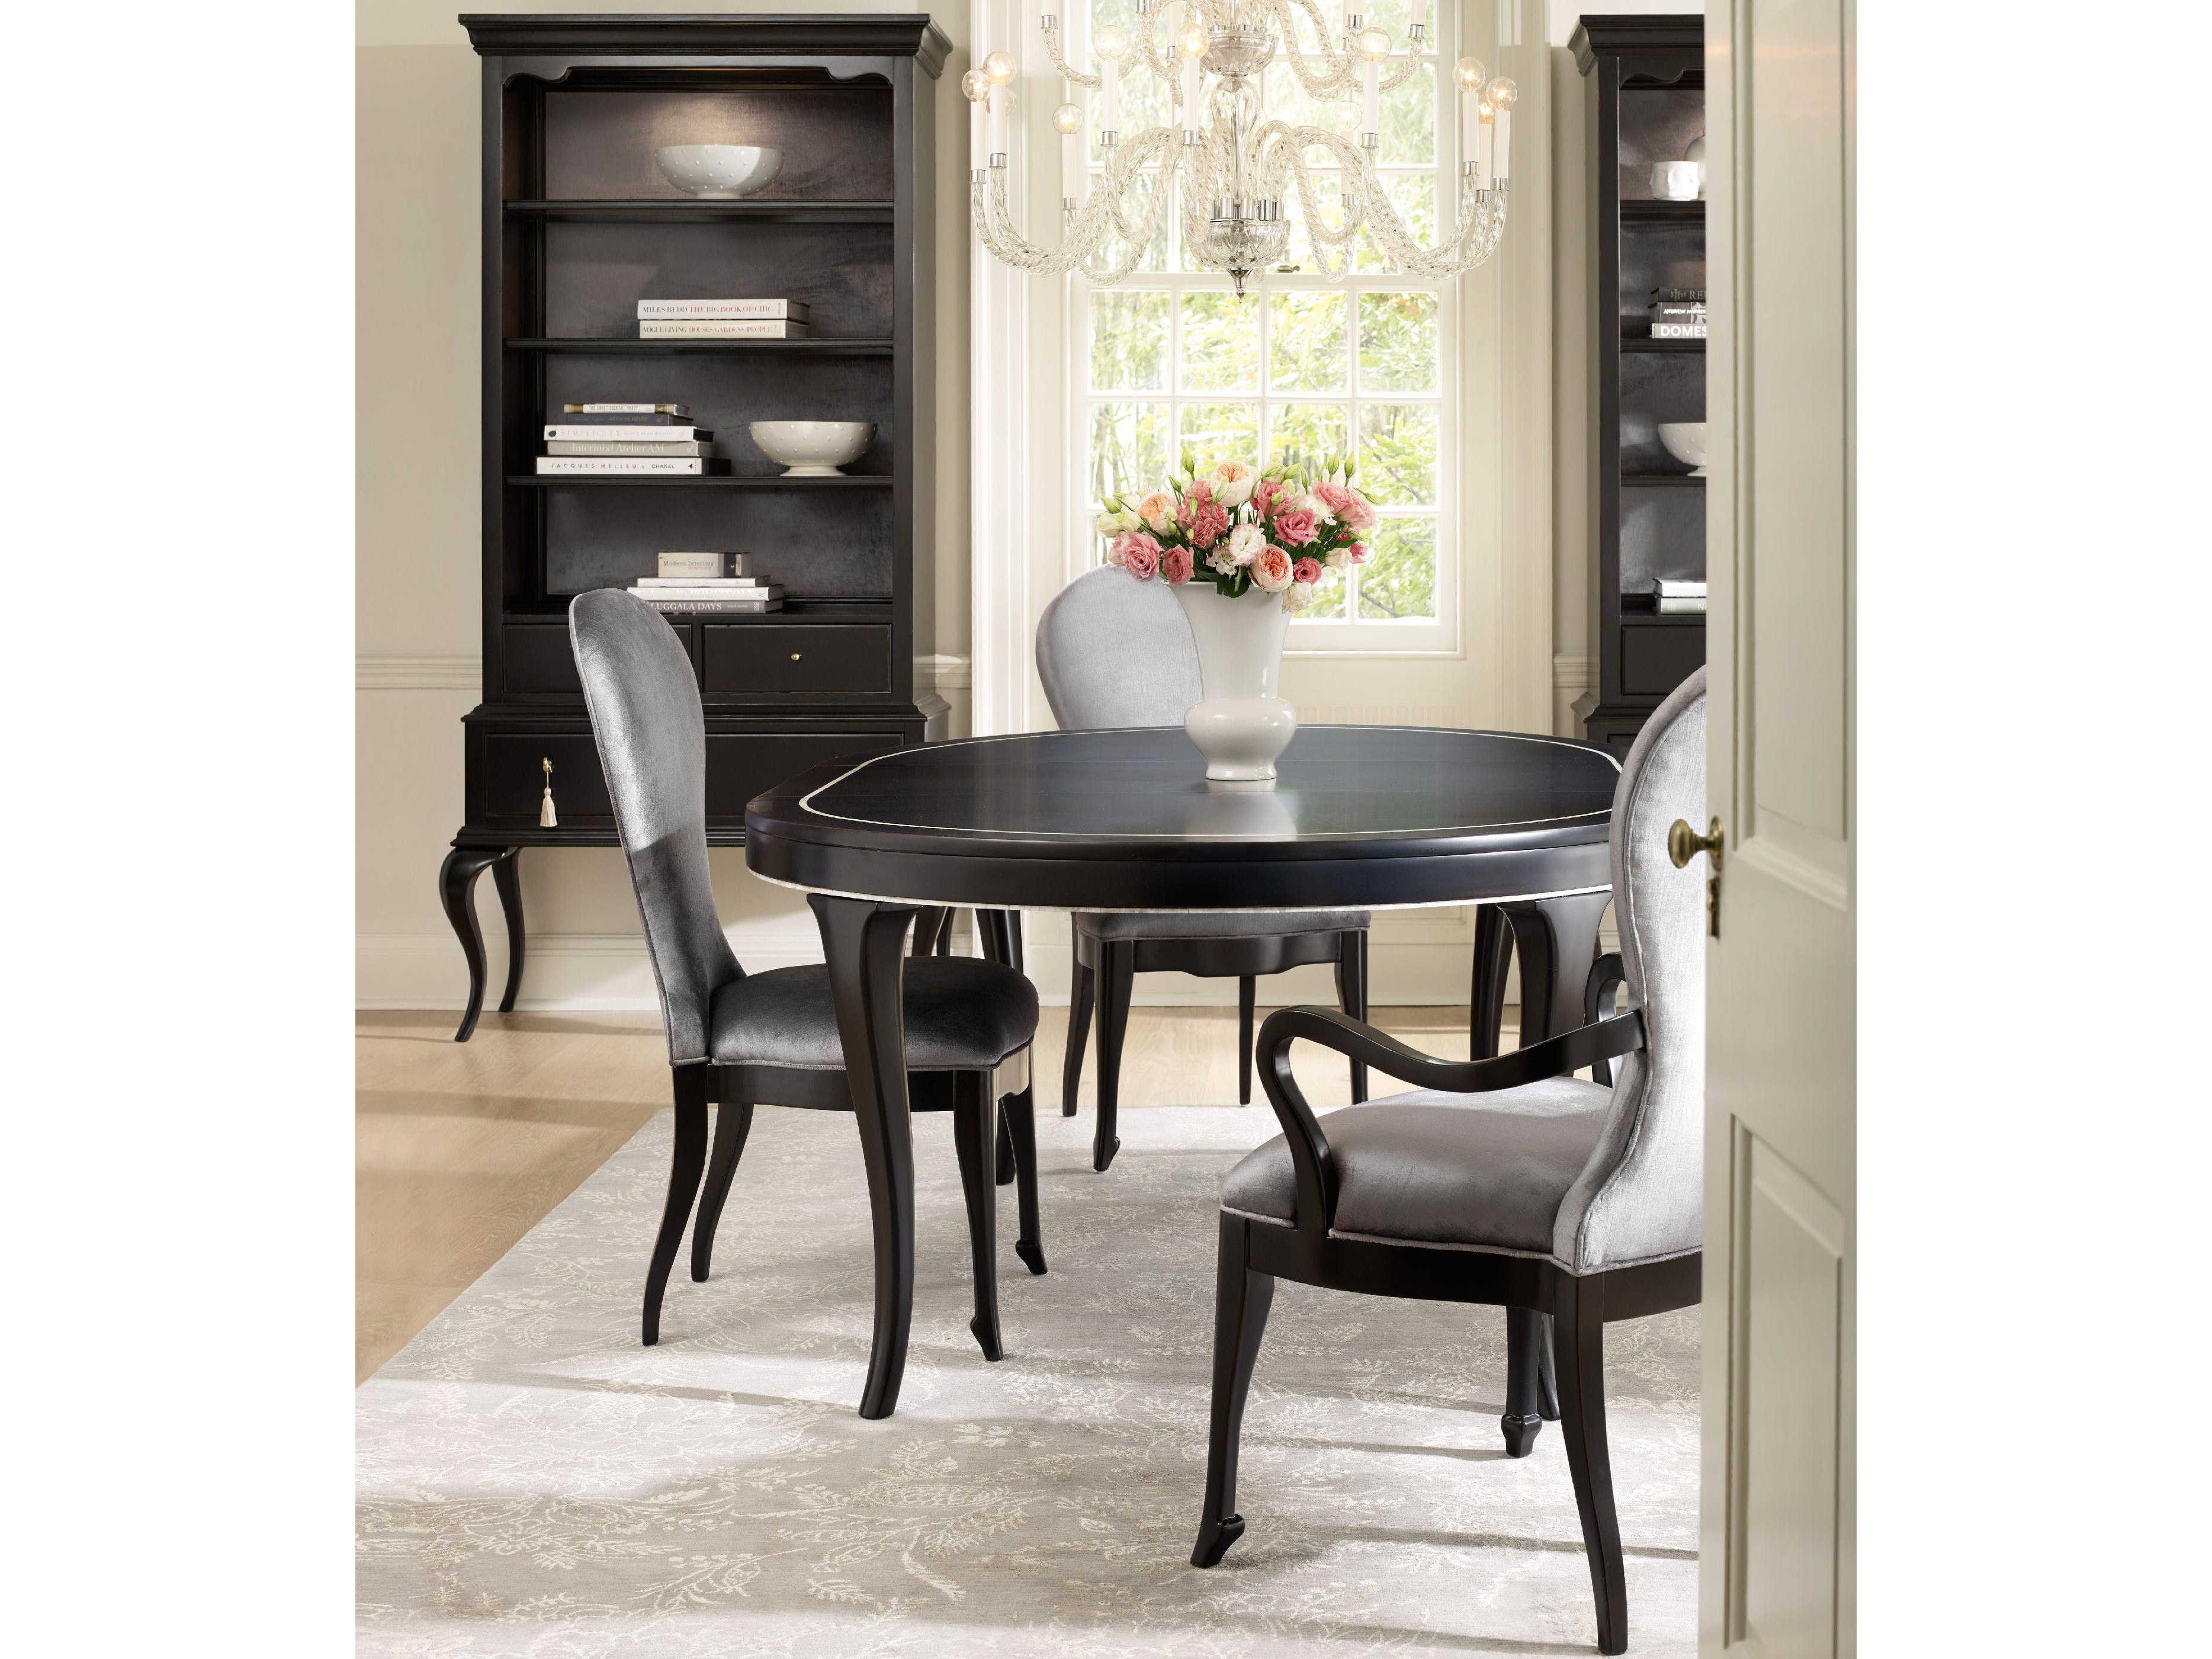 Hooker Furniture Cynthia Rowley Black 54 74 L X 54 W